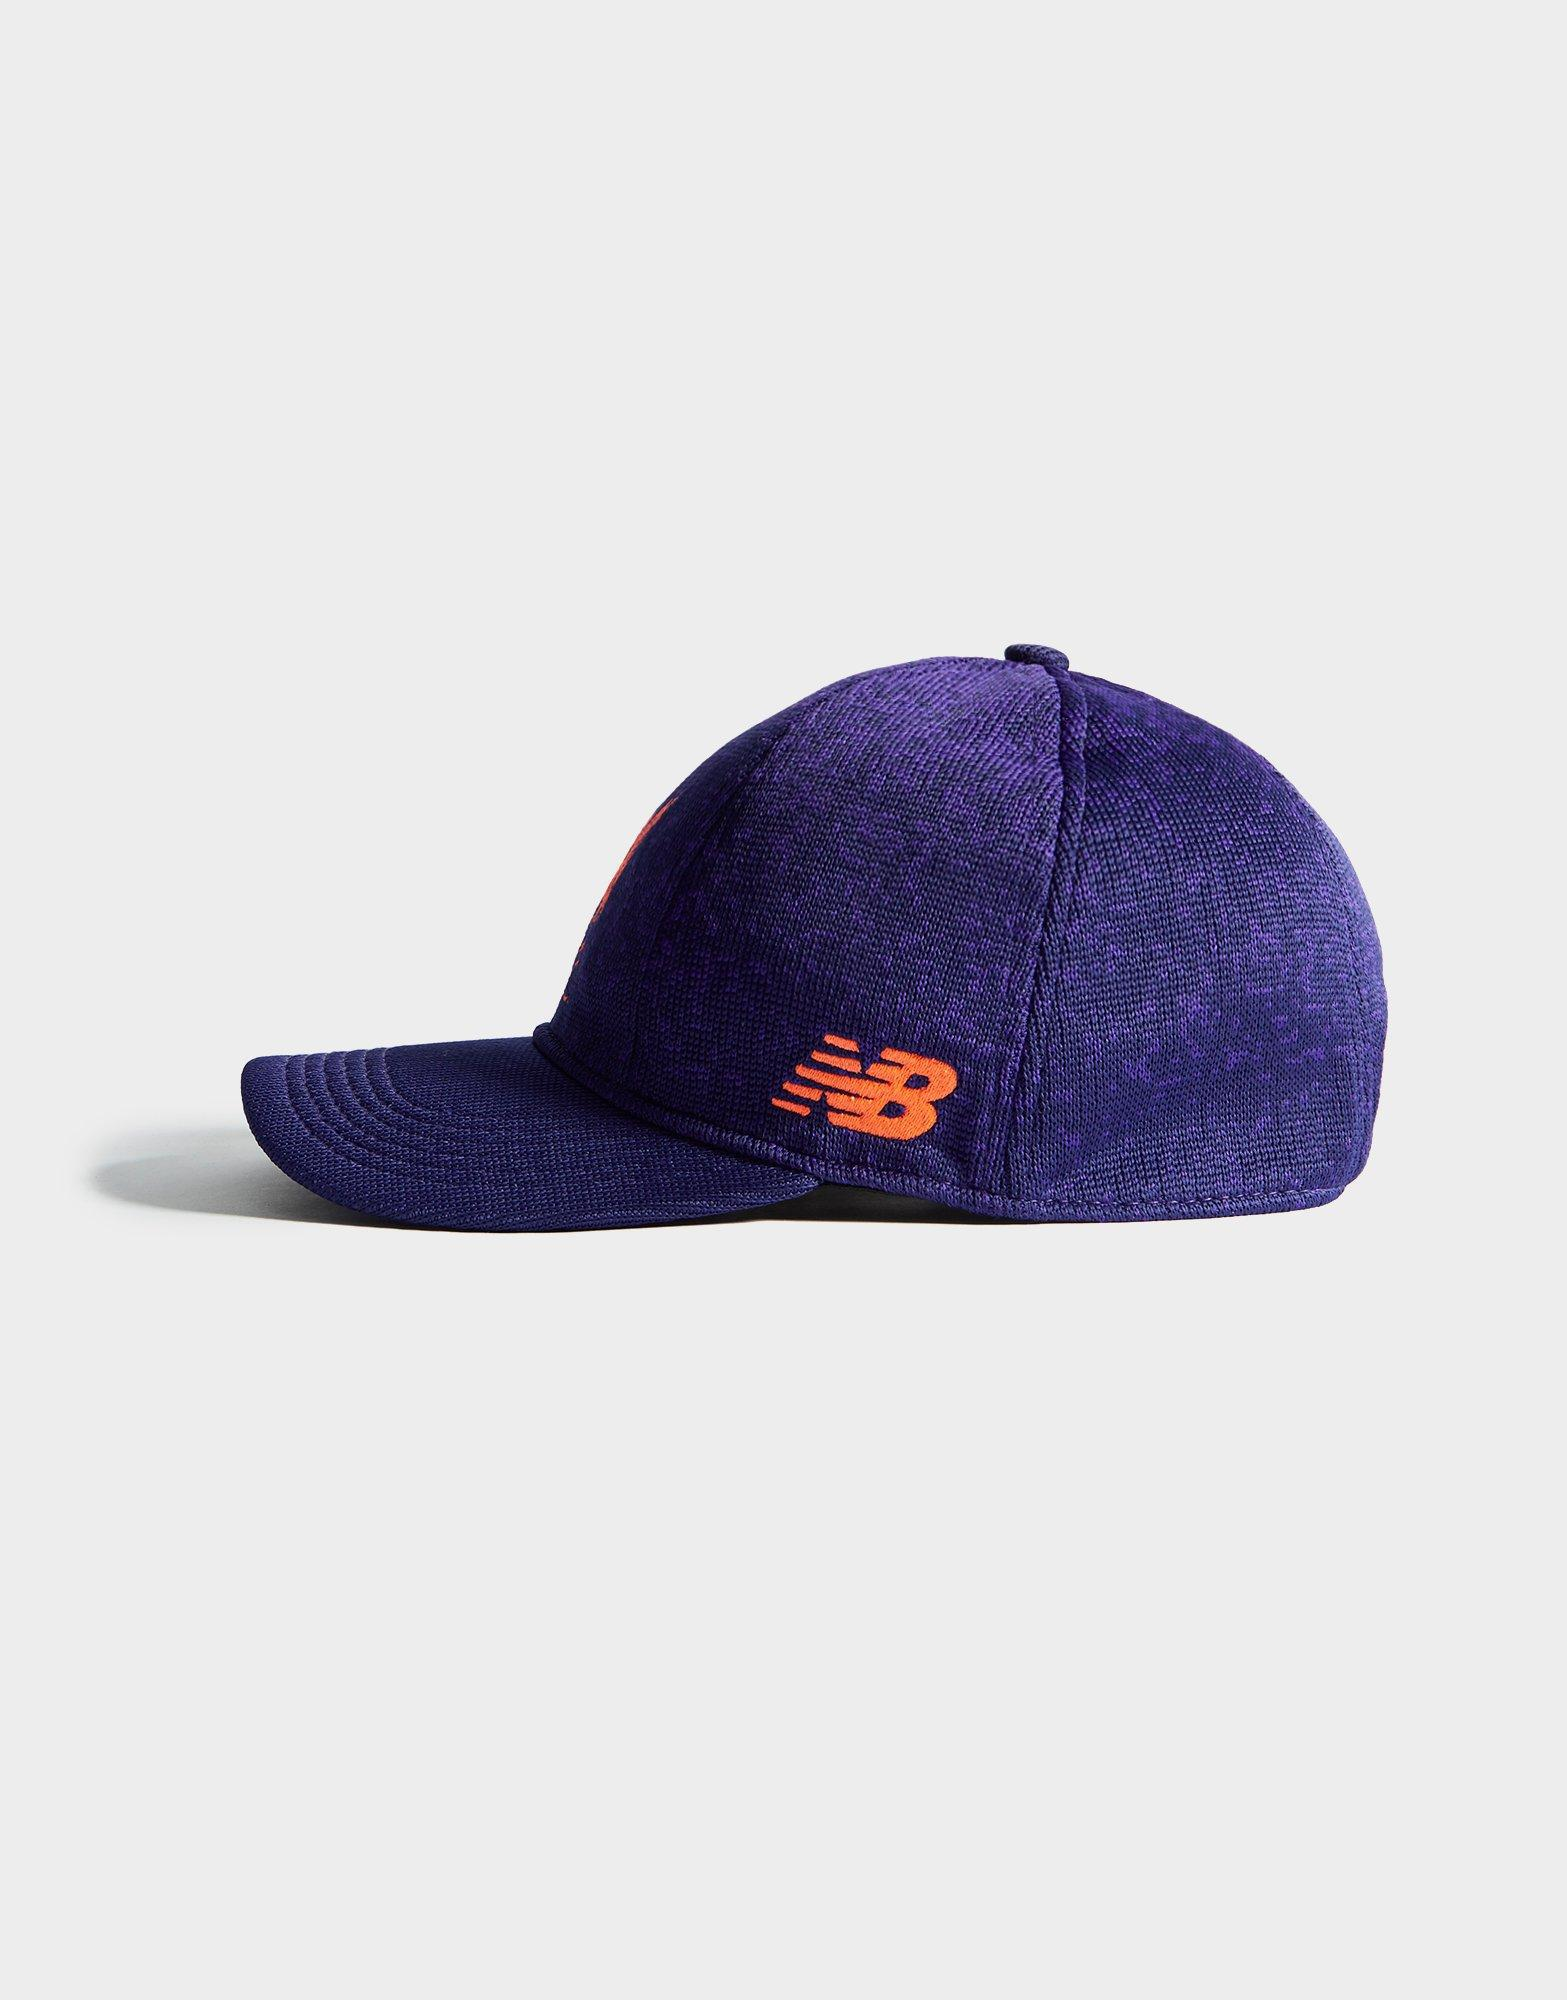 4bc919fb033 lyst – new balance liverpool fc klopp cap in purple. Download Image 1567 X  2000